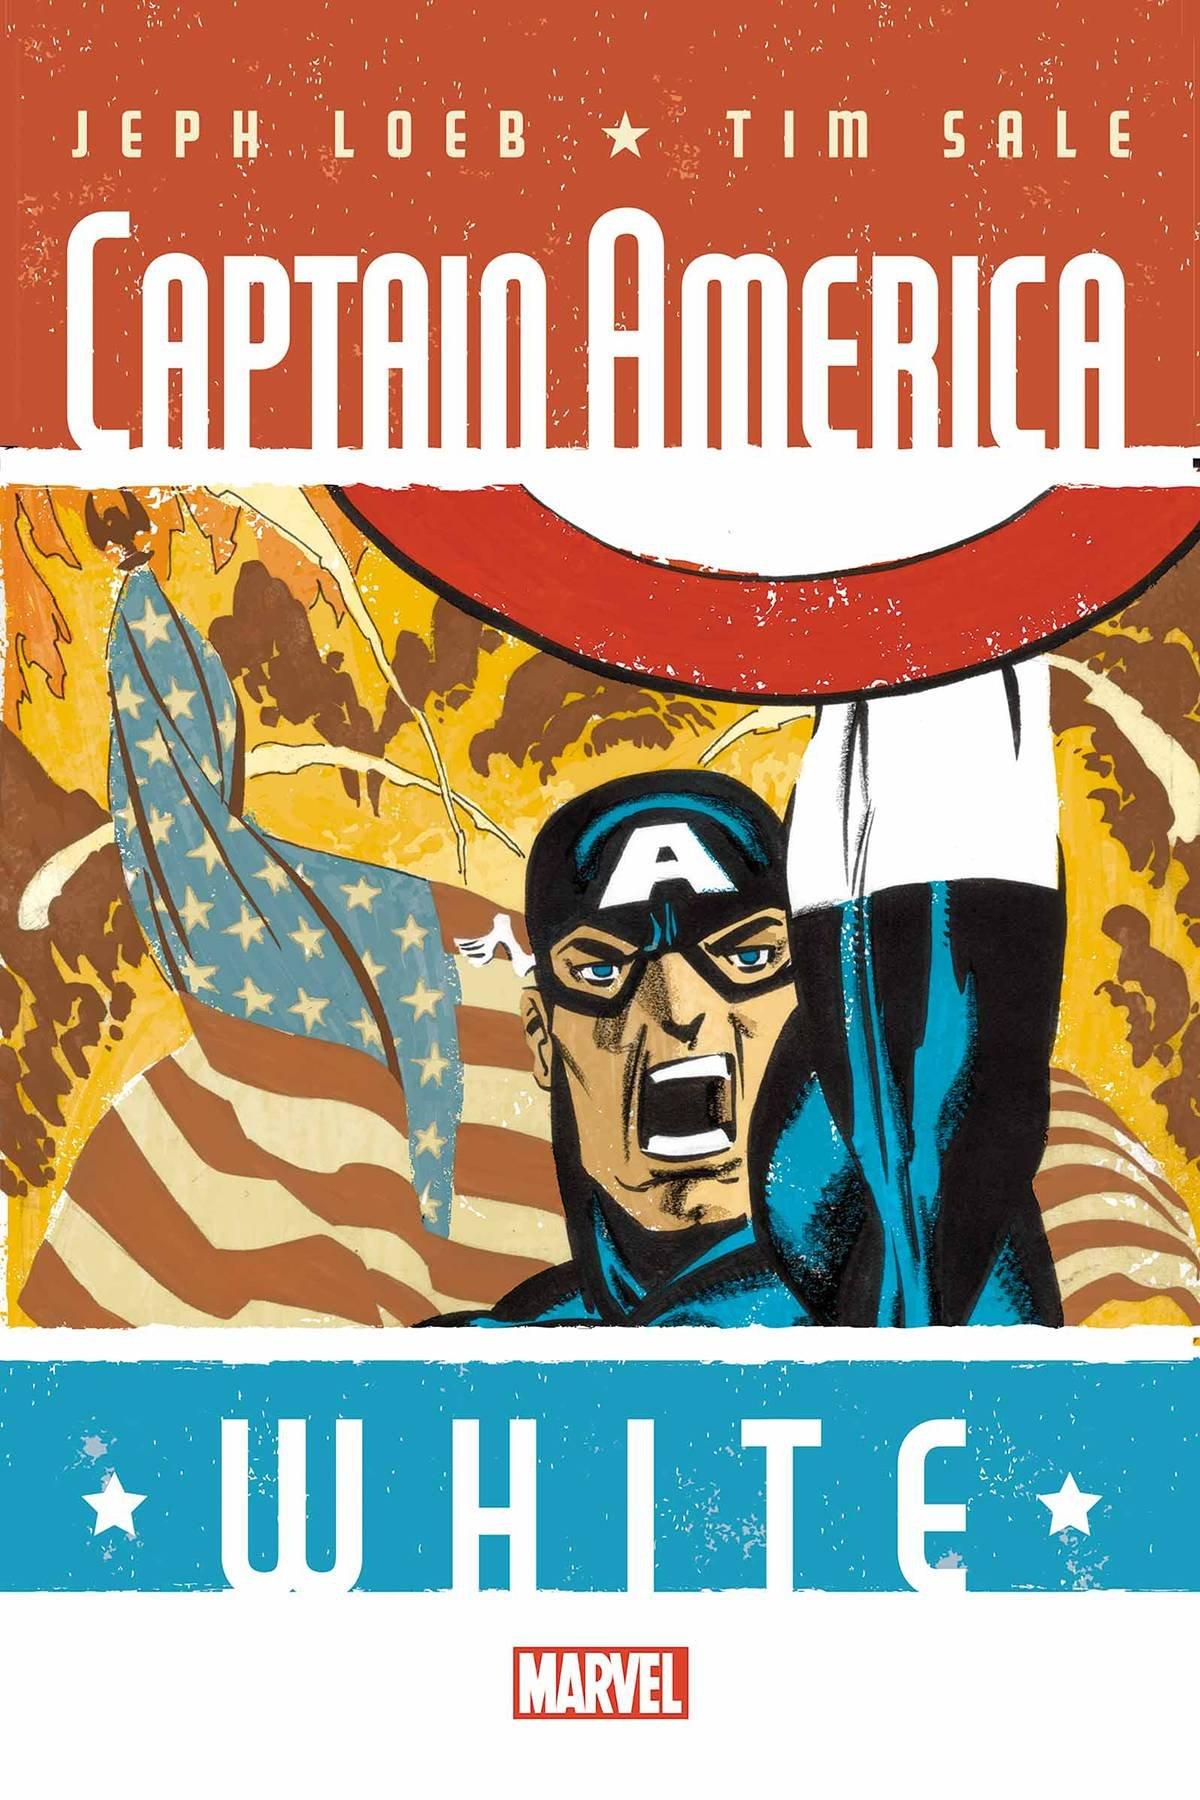 Download CAPTAIN AMERICA WHITE #1 (OF 5) ebook